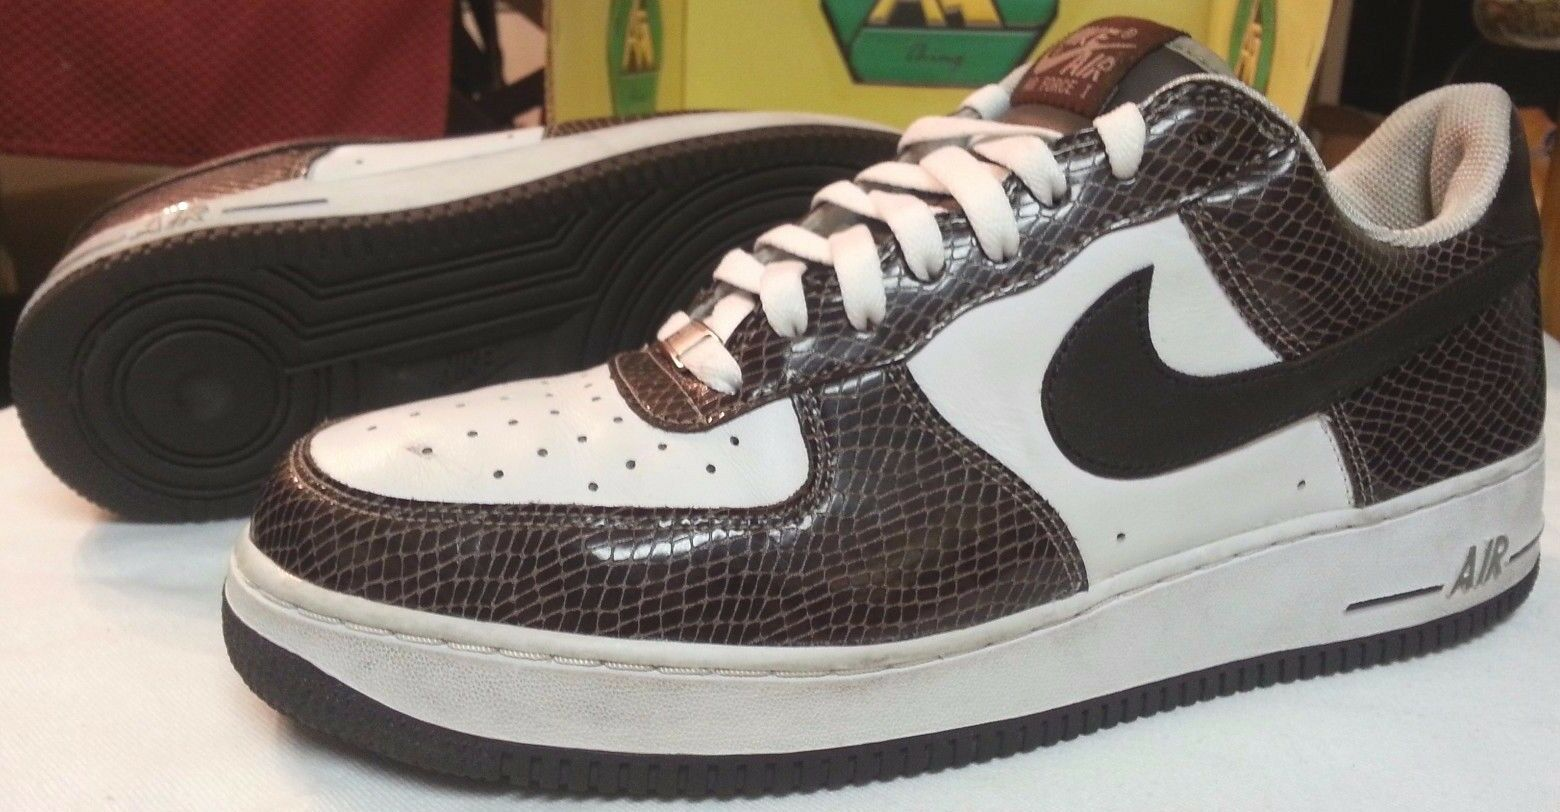 2004 Nike Air Force 1 Low Premium Snakeskin men sz 12 white brown 309096-121